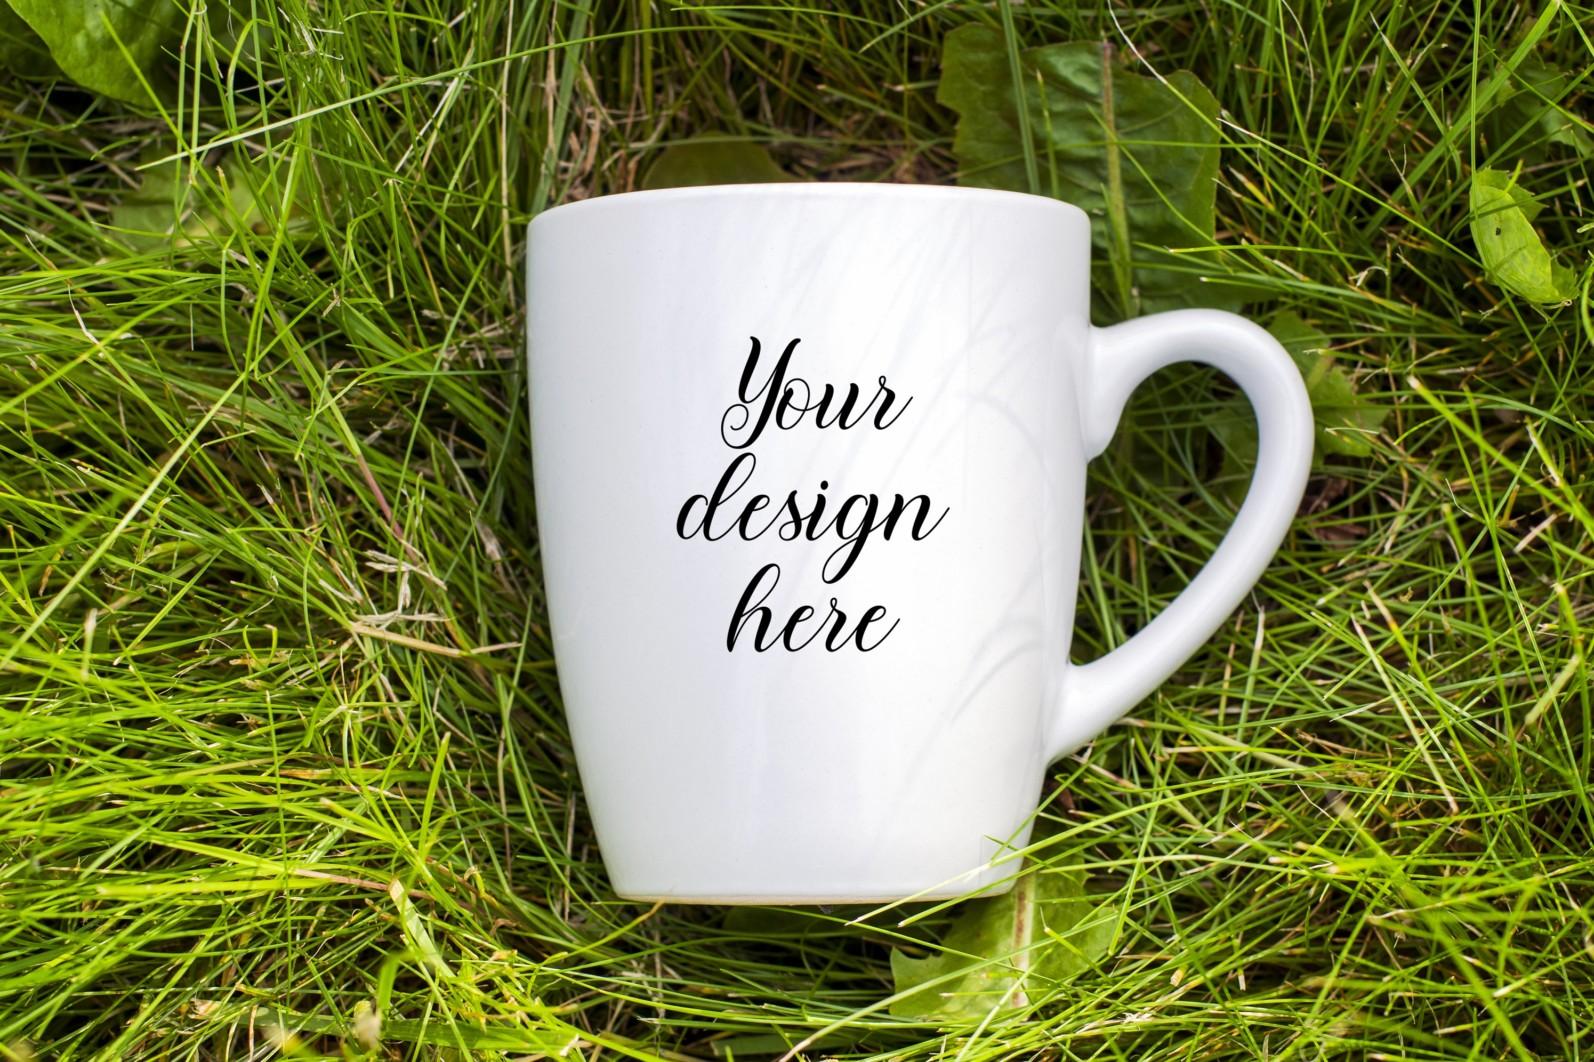 Coffee mug mockup bundle. Mug template bundle. PSD, JPEG files. - 3 1 1 scaled -